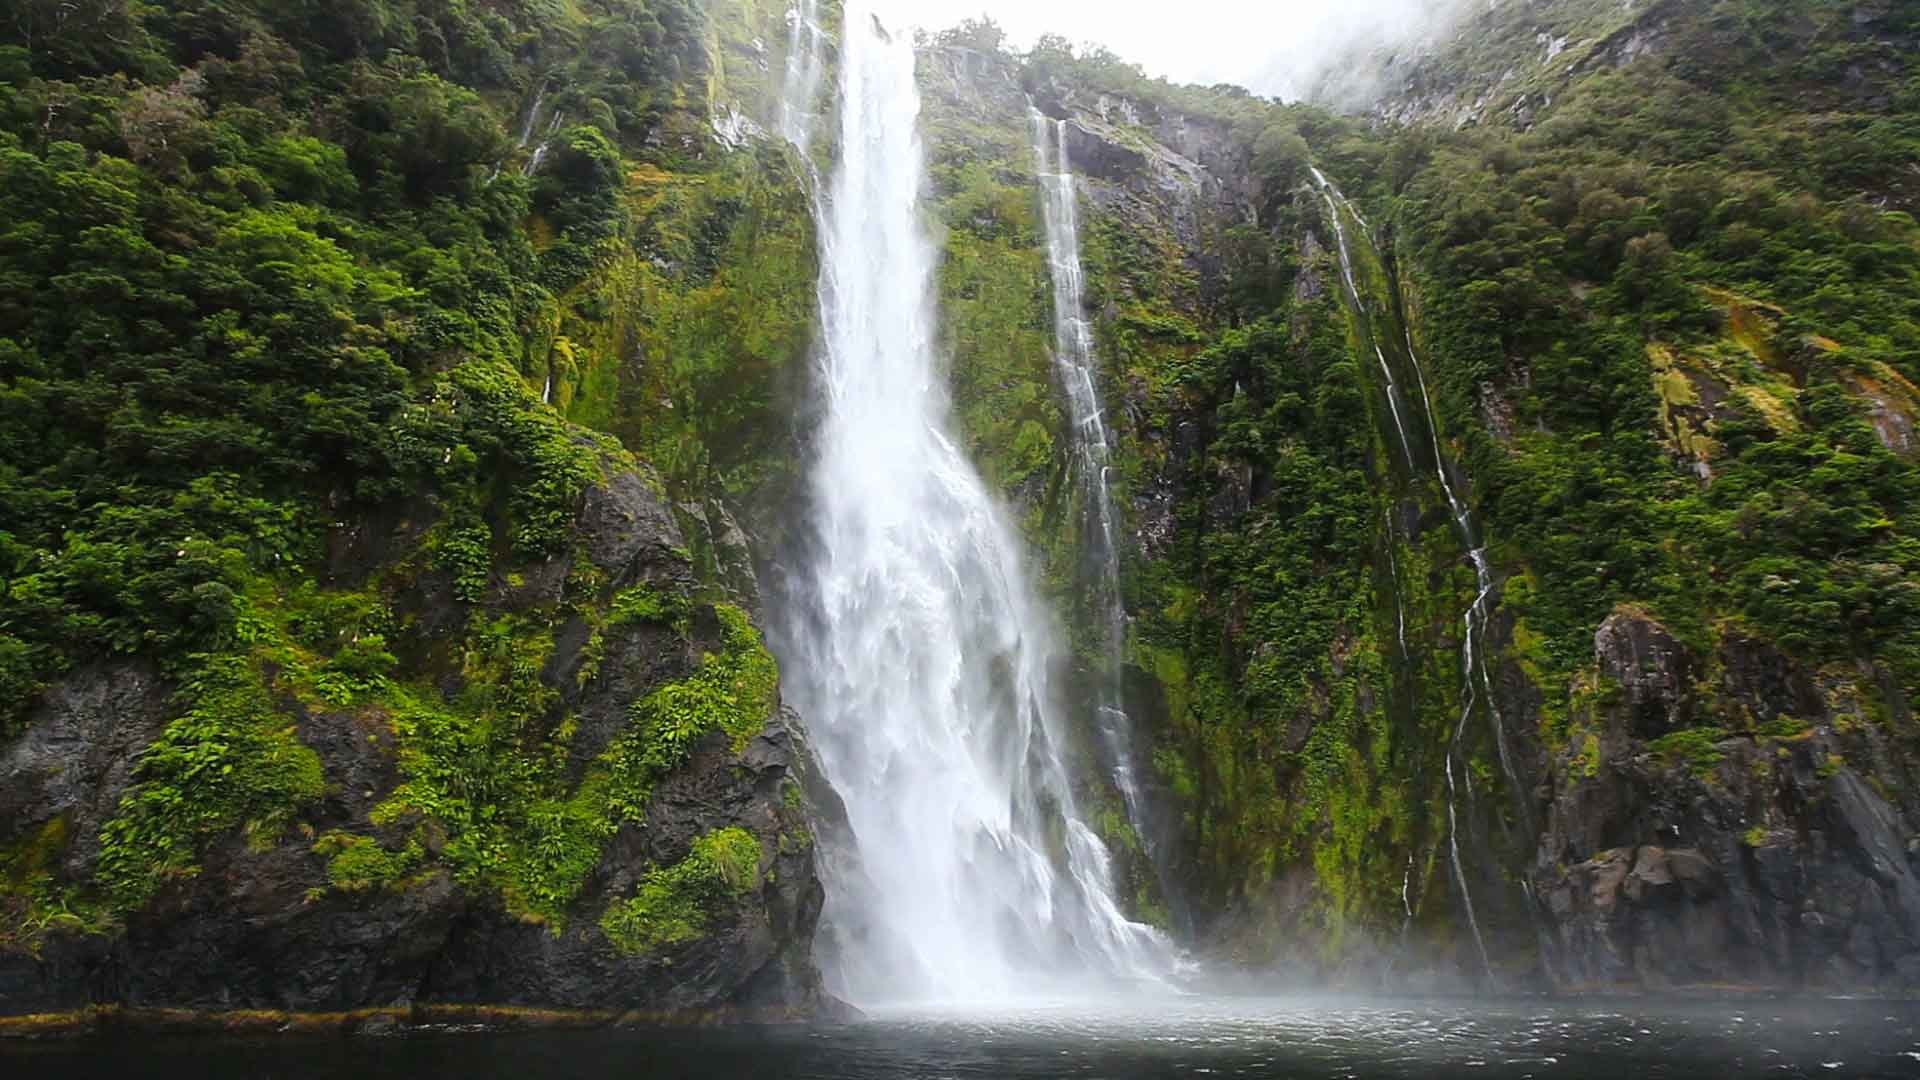 Jog Falls Hd Wallpaper Gaia Meditation Free Meditation Music Amp Sound Healing